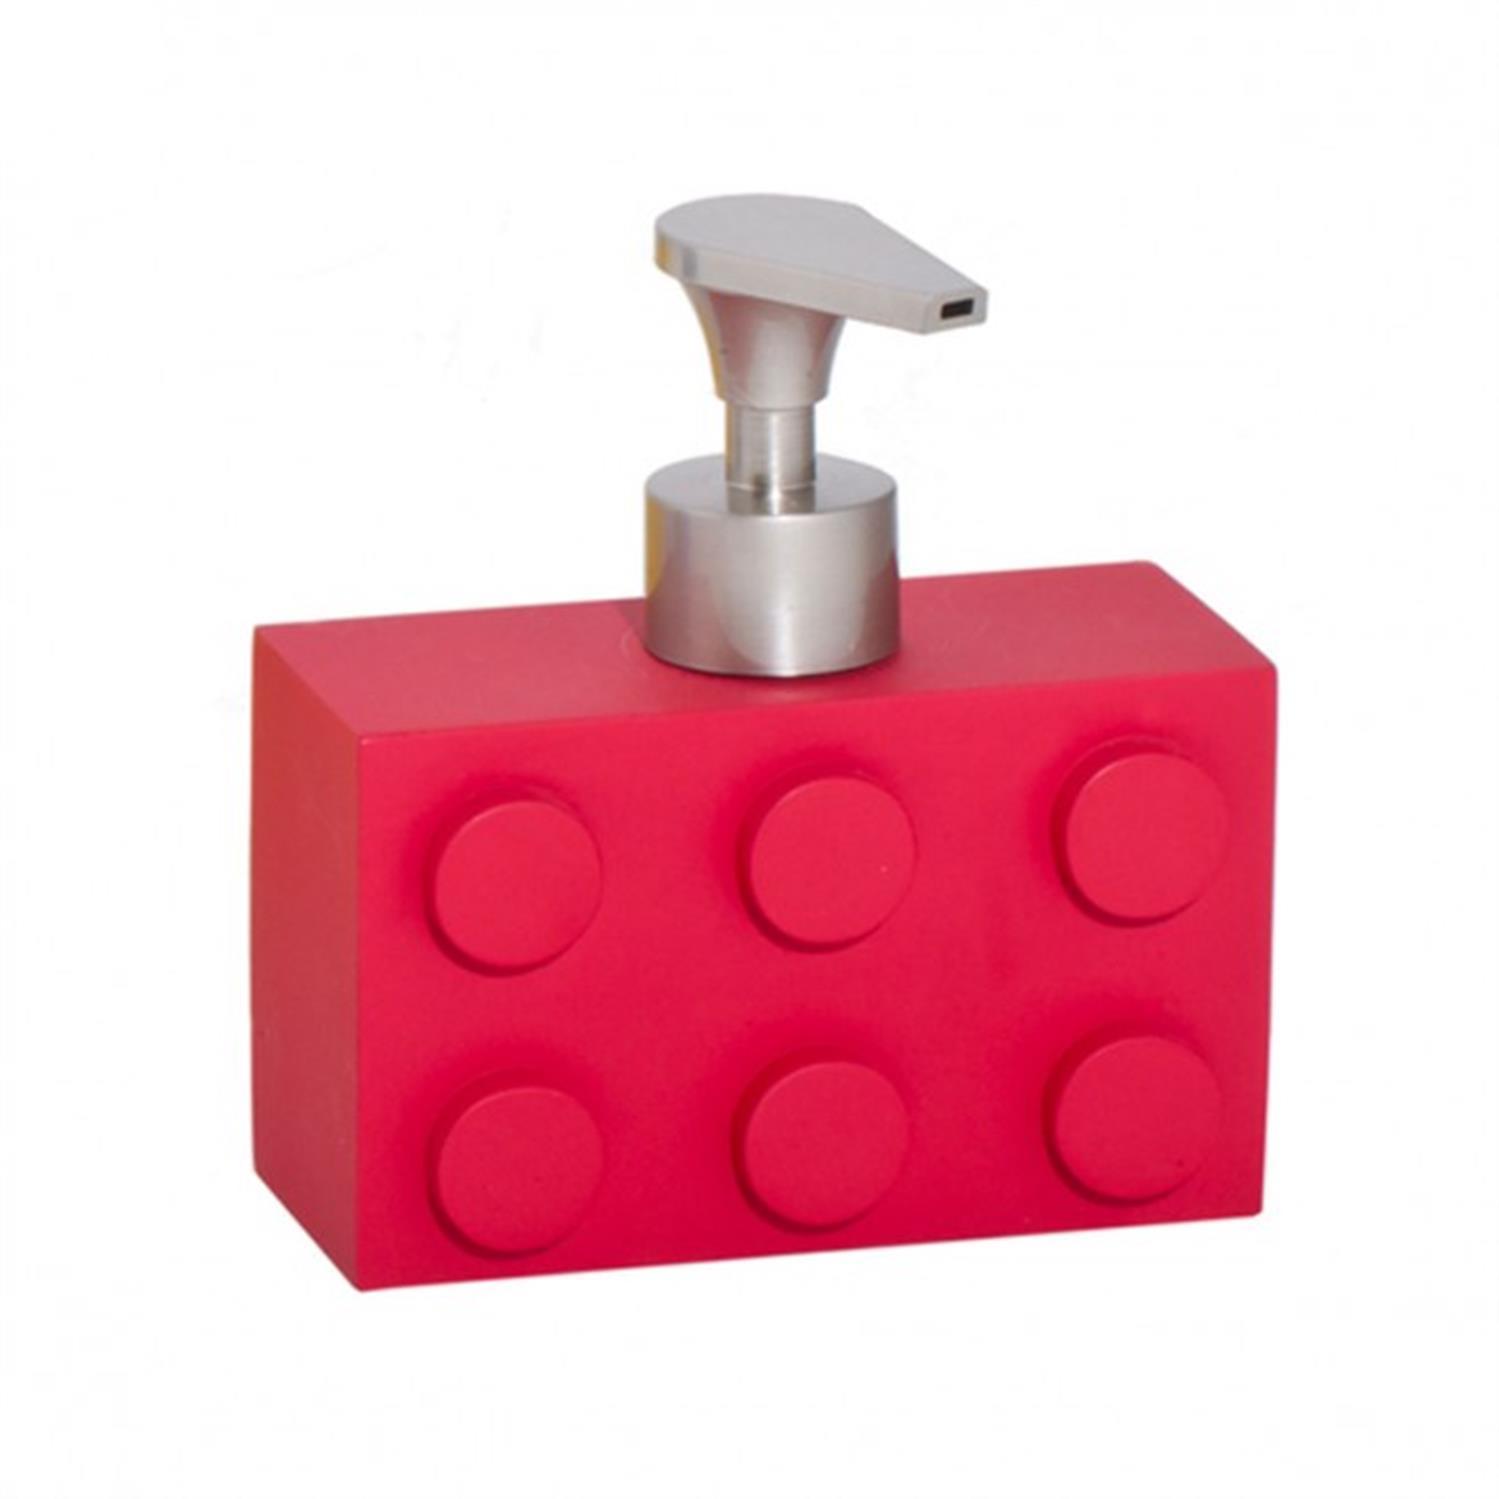 Dispenser Legon κόκκινο 12.5×5.5×13.5cm Marva 478114